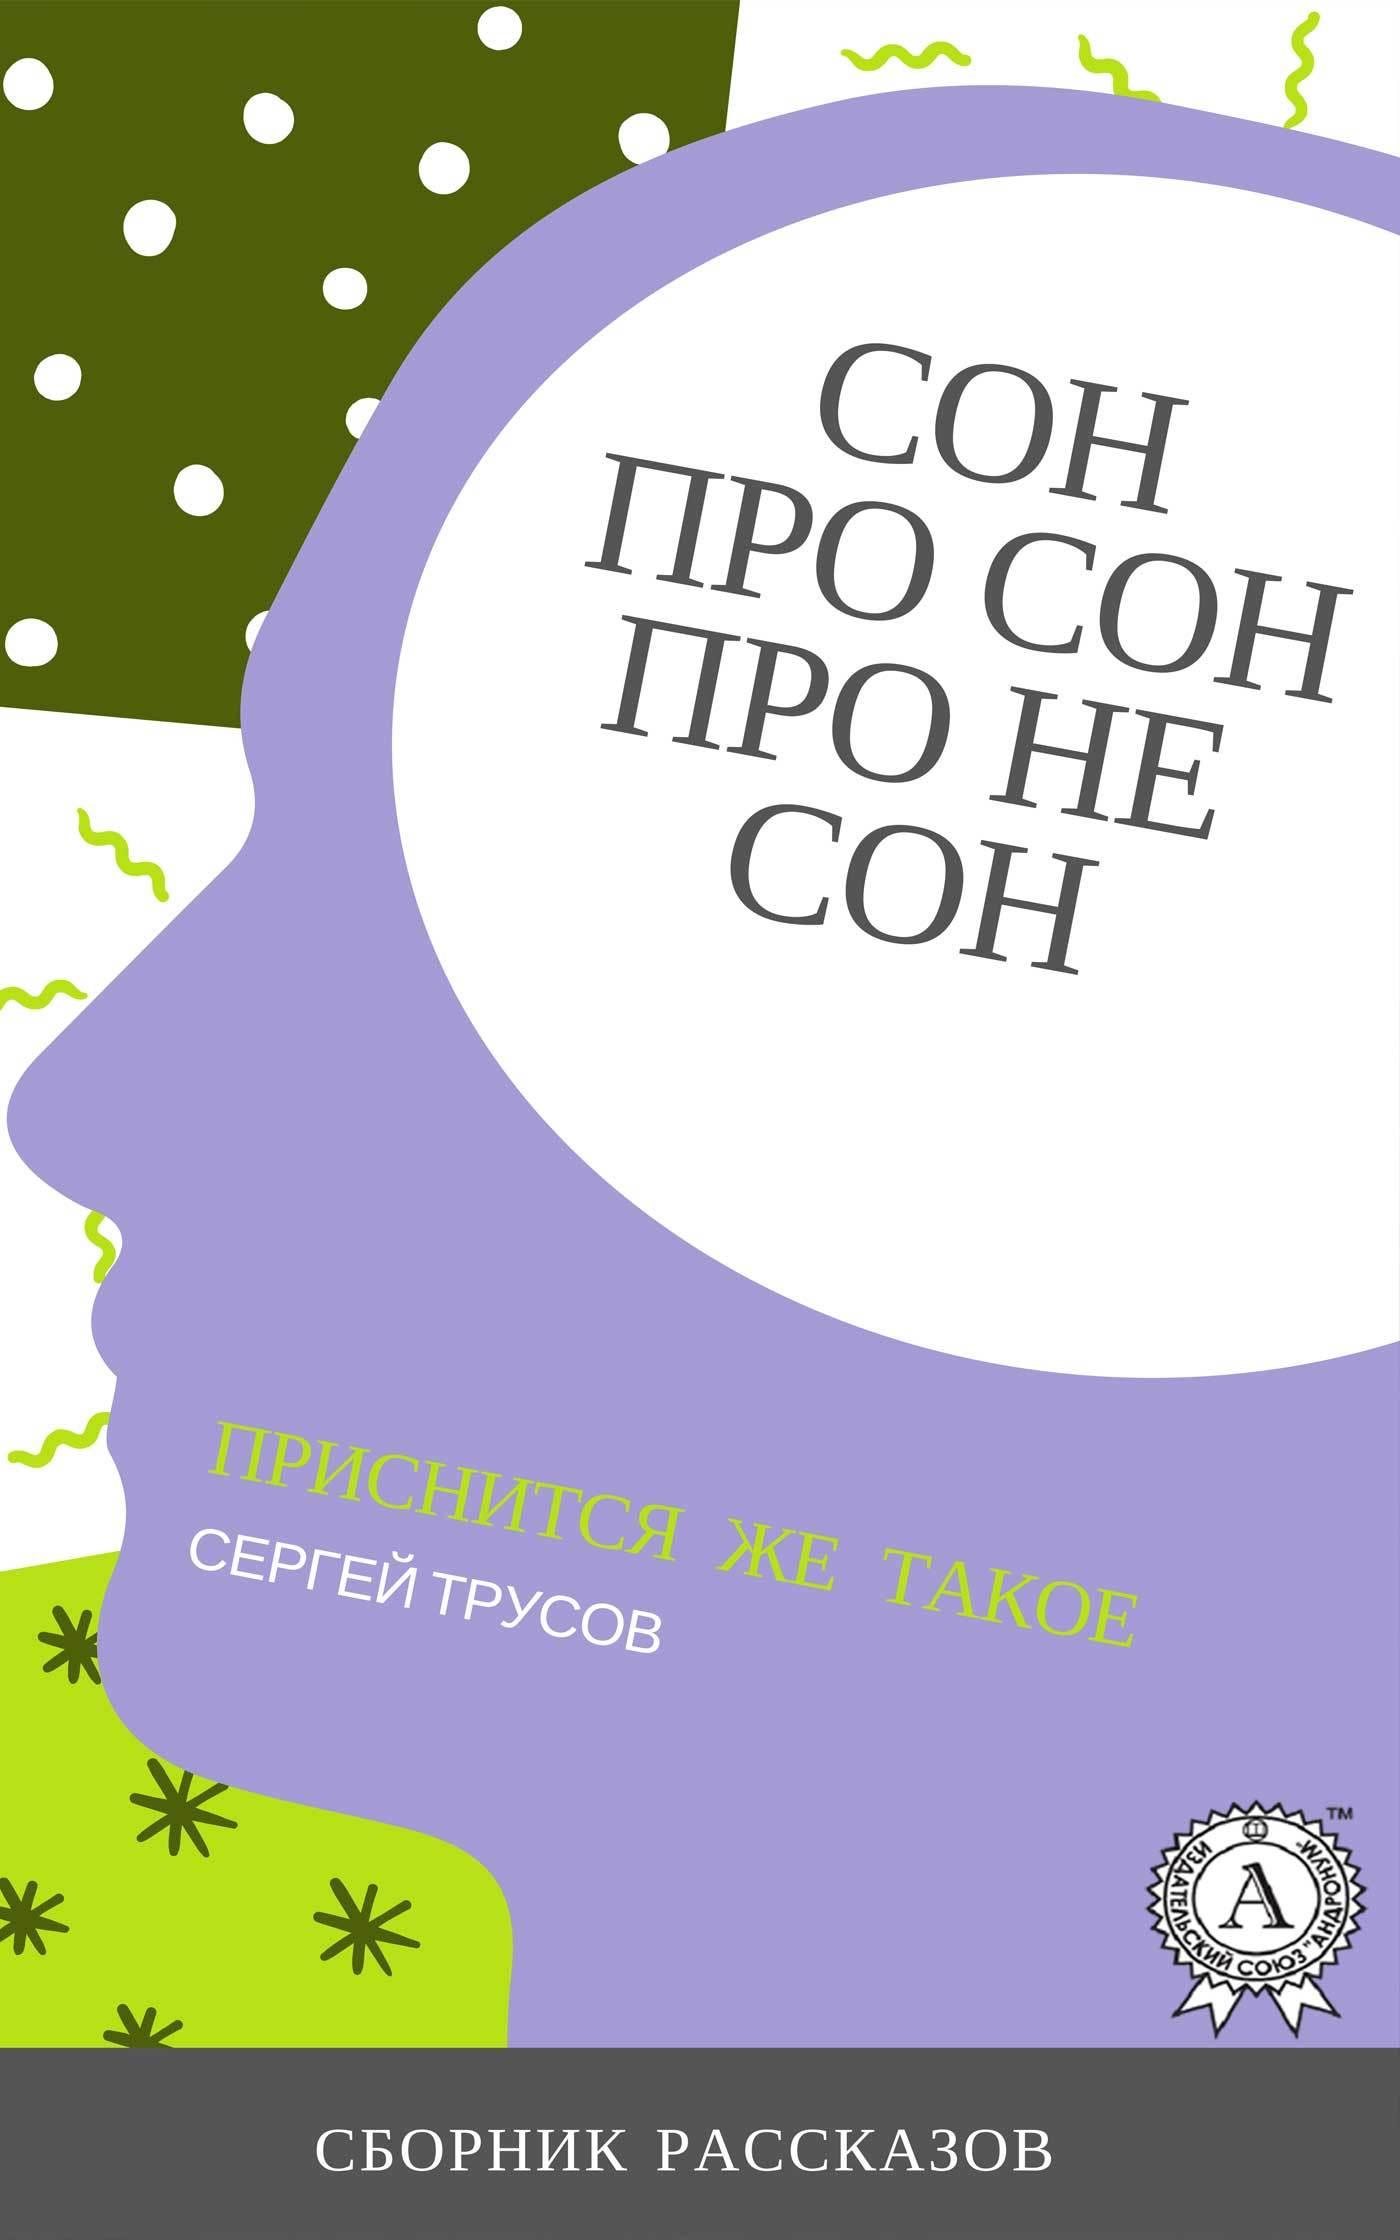 Сергей Трусов - Сон, про сон, про не сон